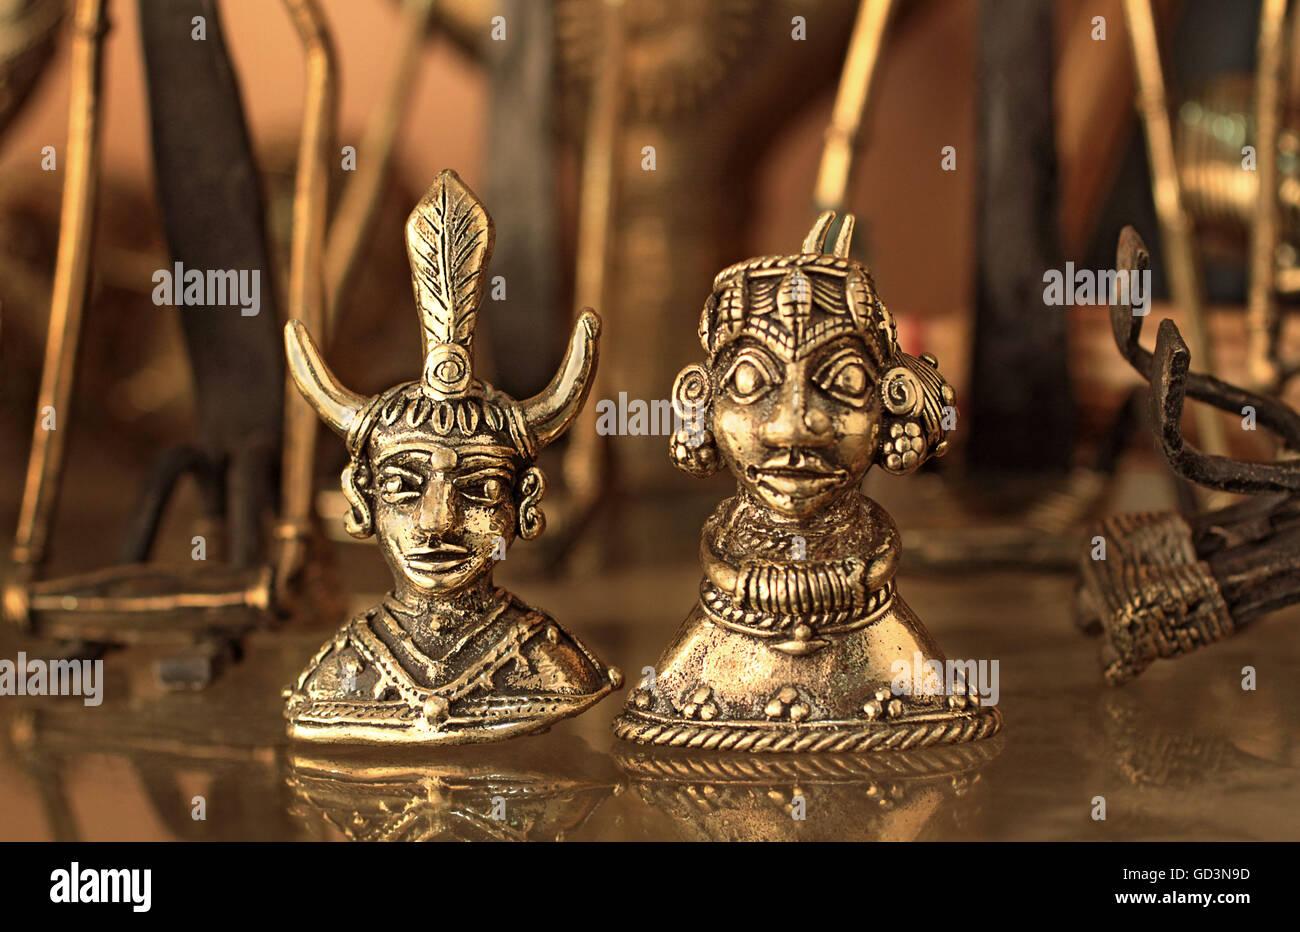 Bell Metal Handicraft Bastar Chhattisgarh India Asia Stock Photo